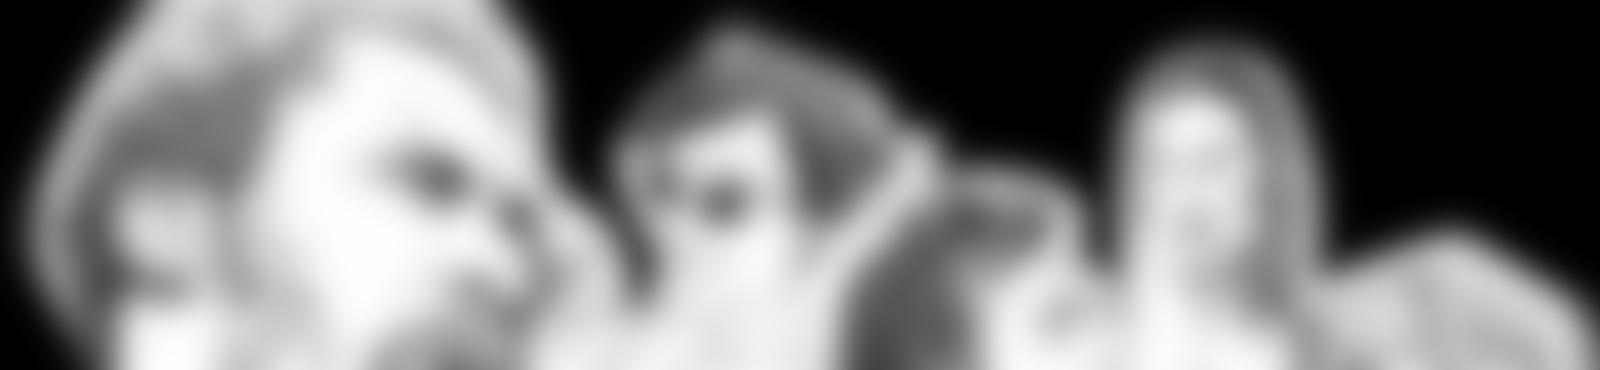 Blurred fed45951 6443 42f3 bce5 c0f7f9740981